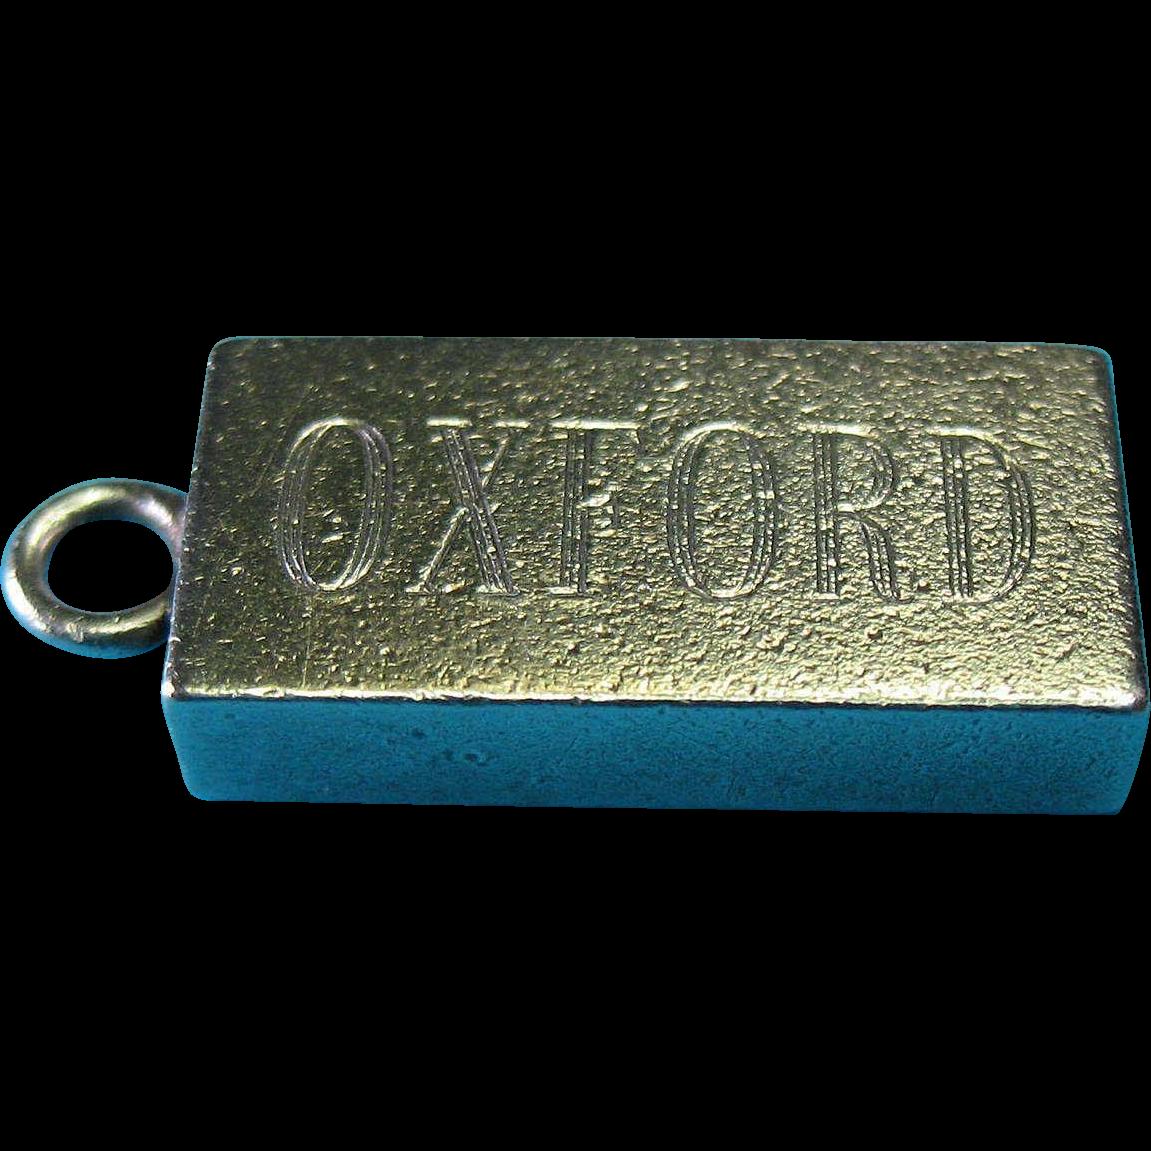 Vintage English Sterling Silver OXFORD Ingot Fob Charm Pendant